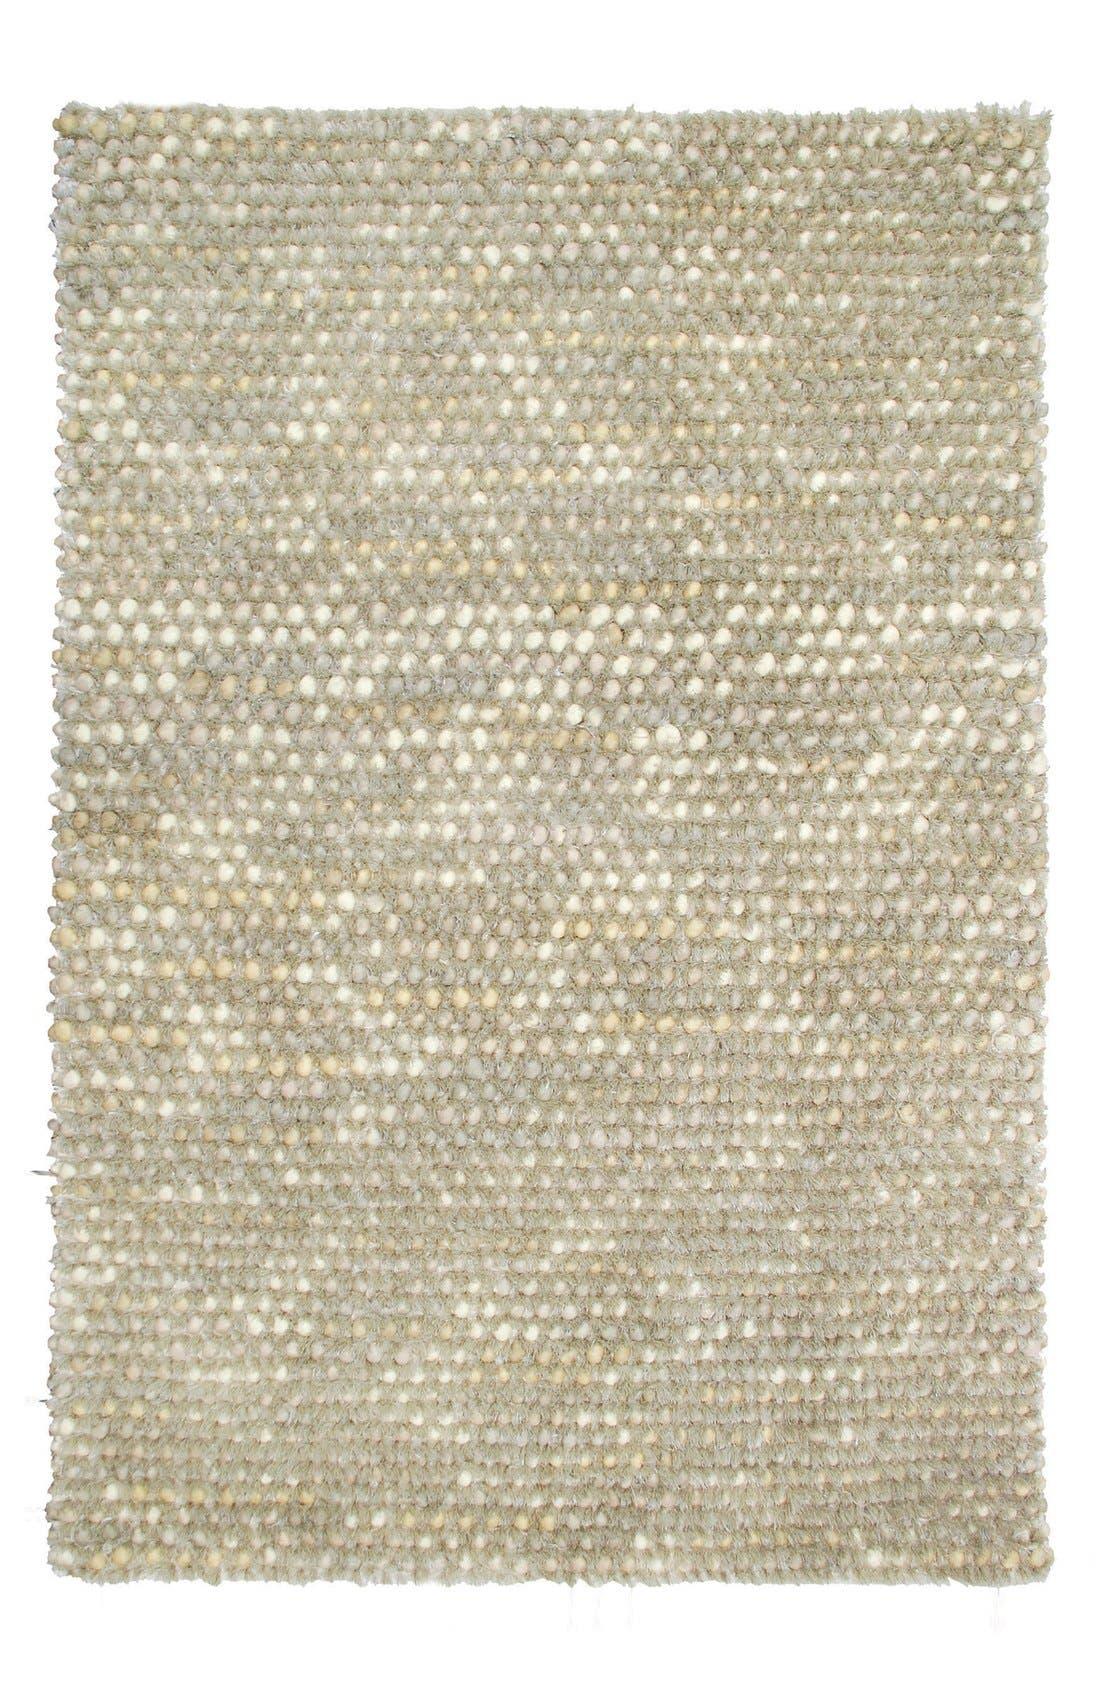 Pebble Shag Rug,                         Main,                         color, 900